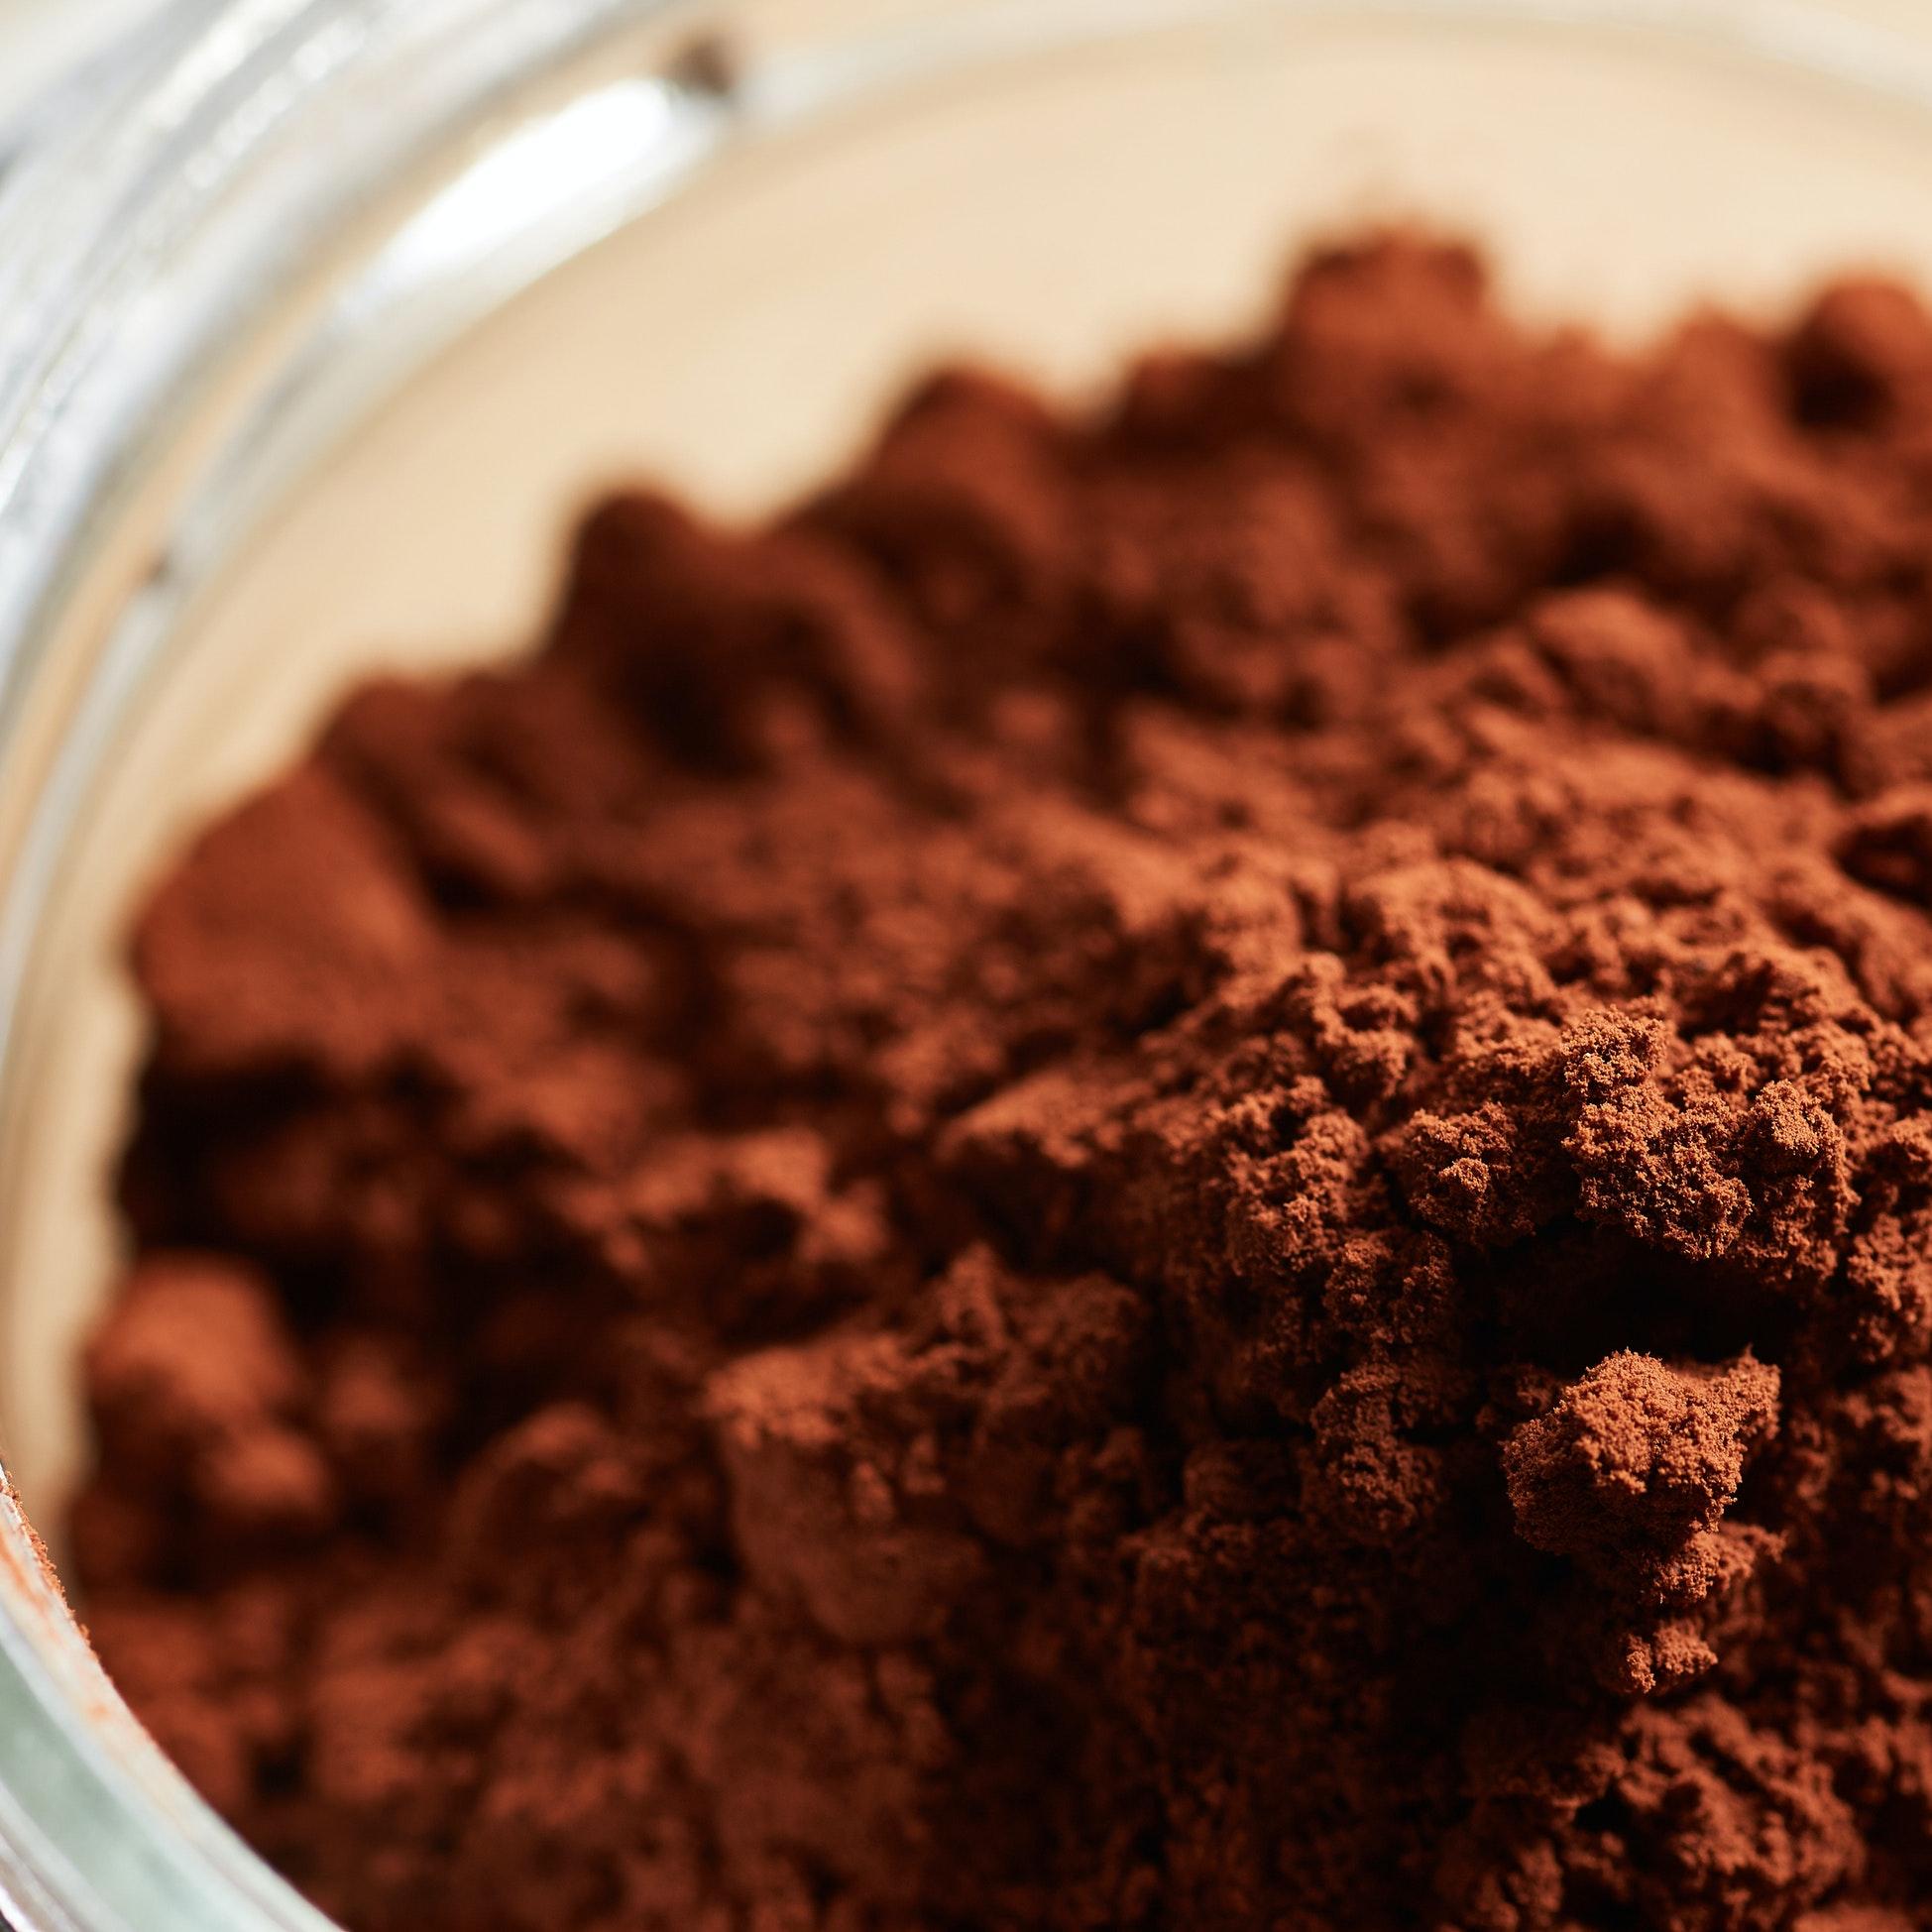 diy natural skin care cocoa